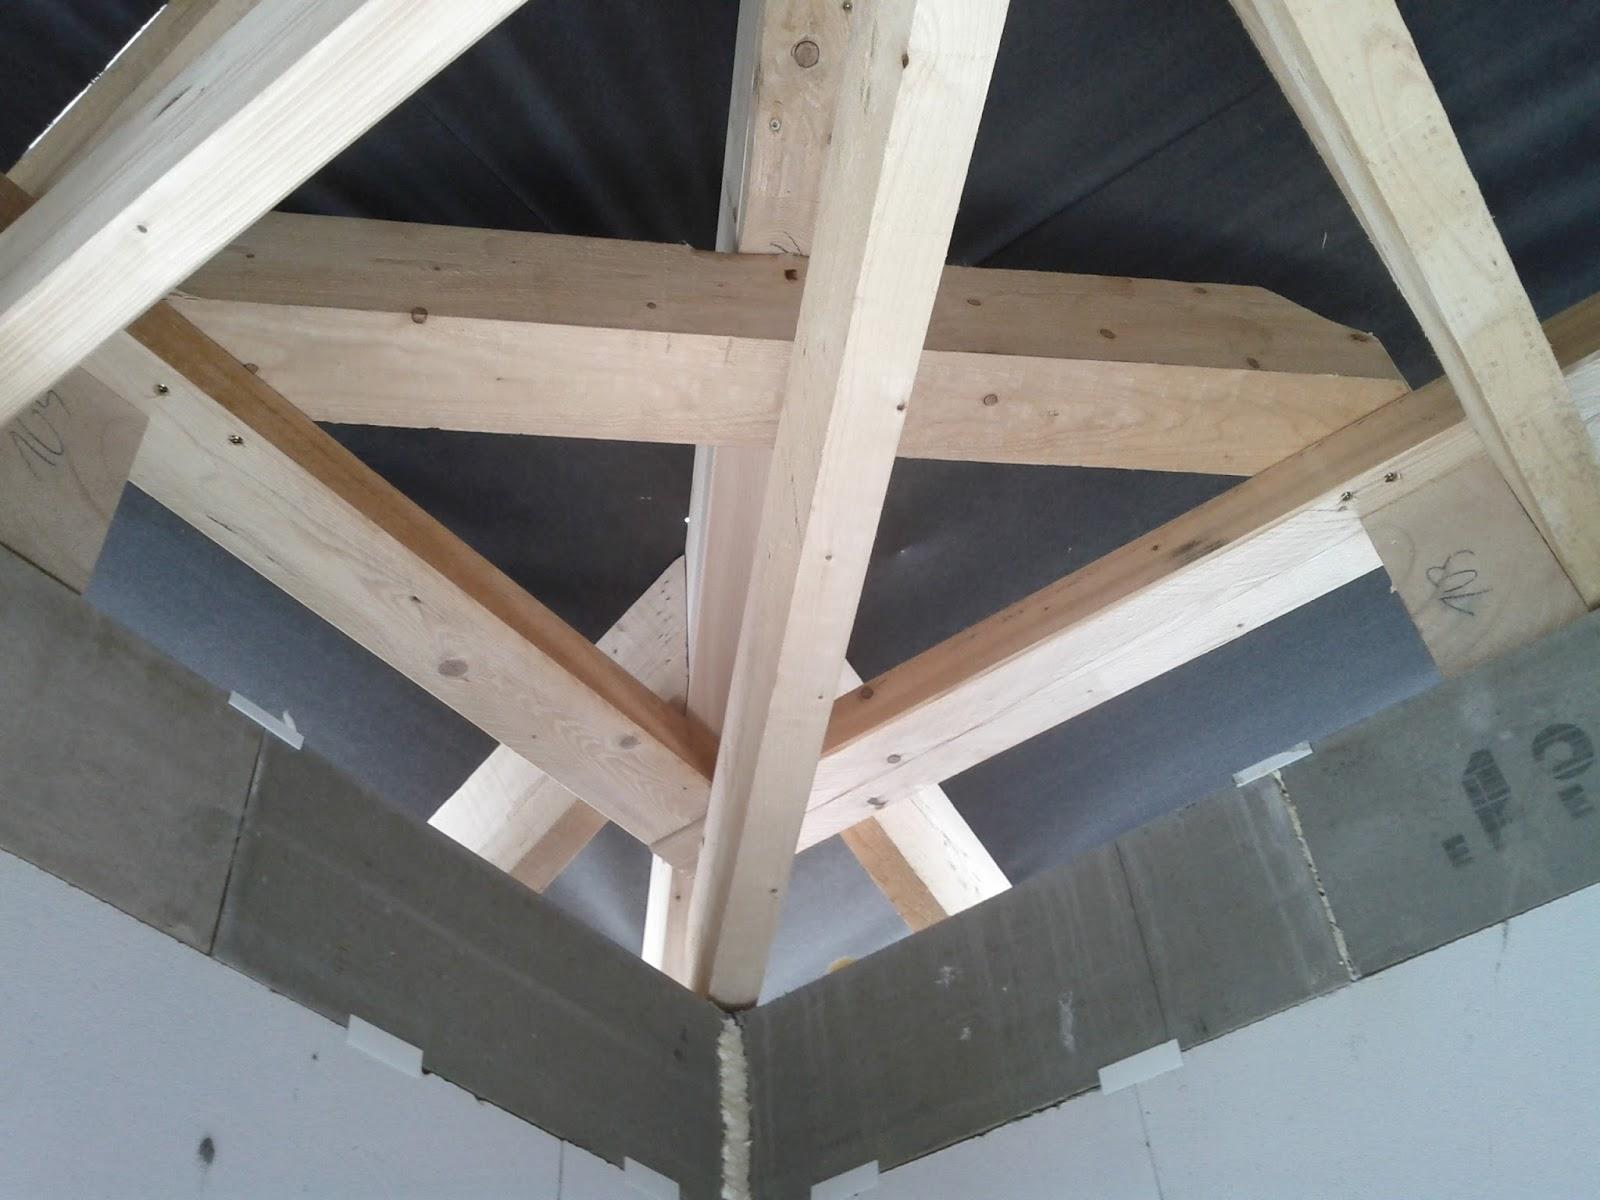 dachstuhl statik berechnen dachkonstruktion dc statik statik dachst hle aufma vor ort. Black Bedroom Furniture Sets. Home Design Ideas